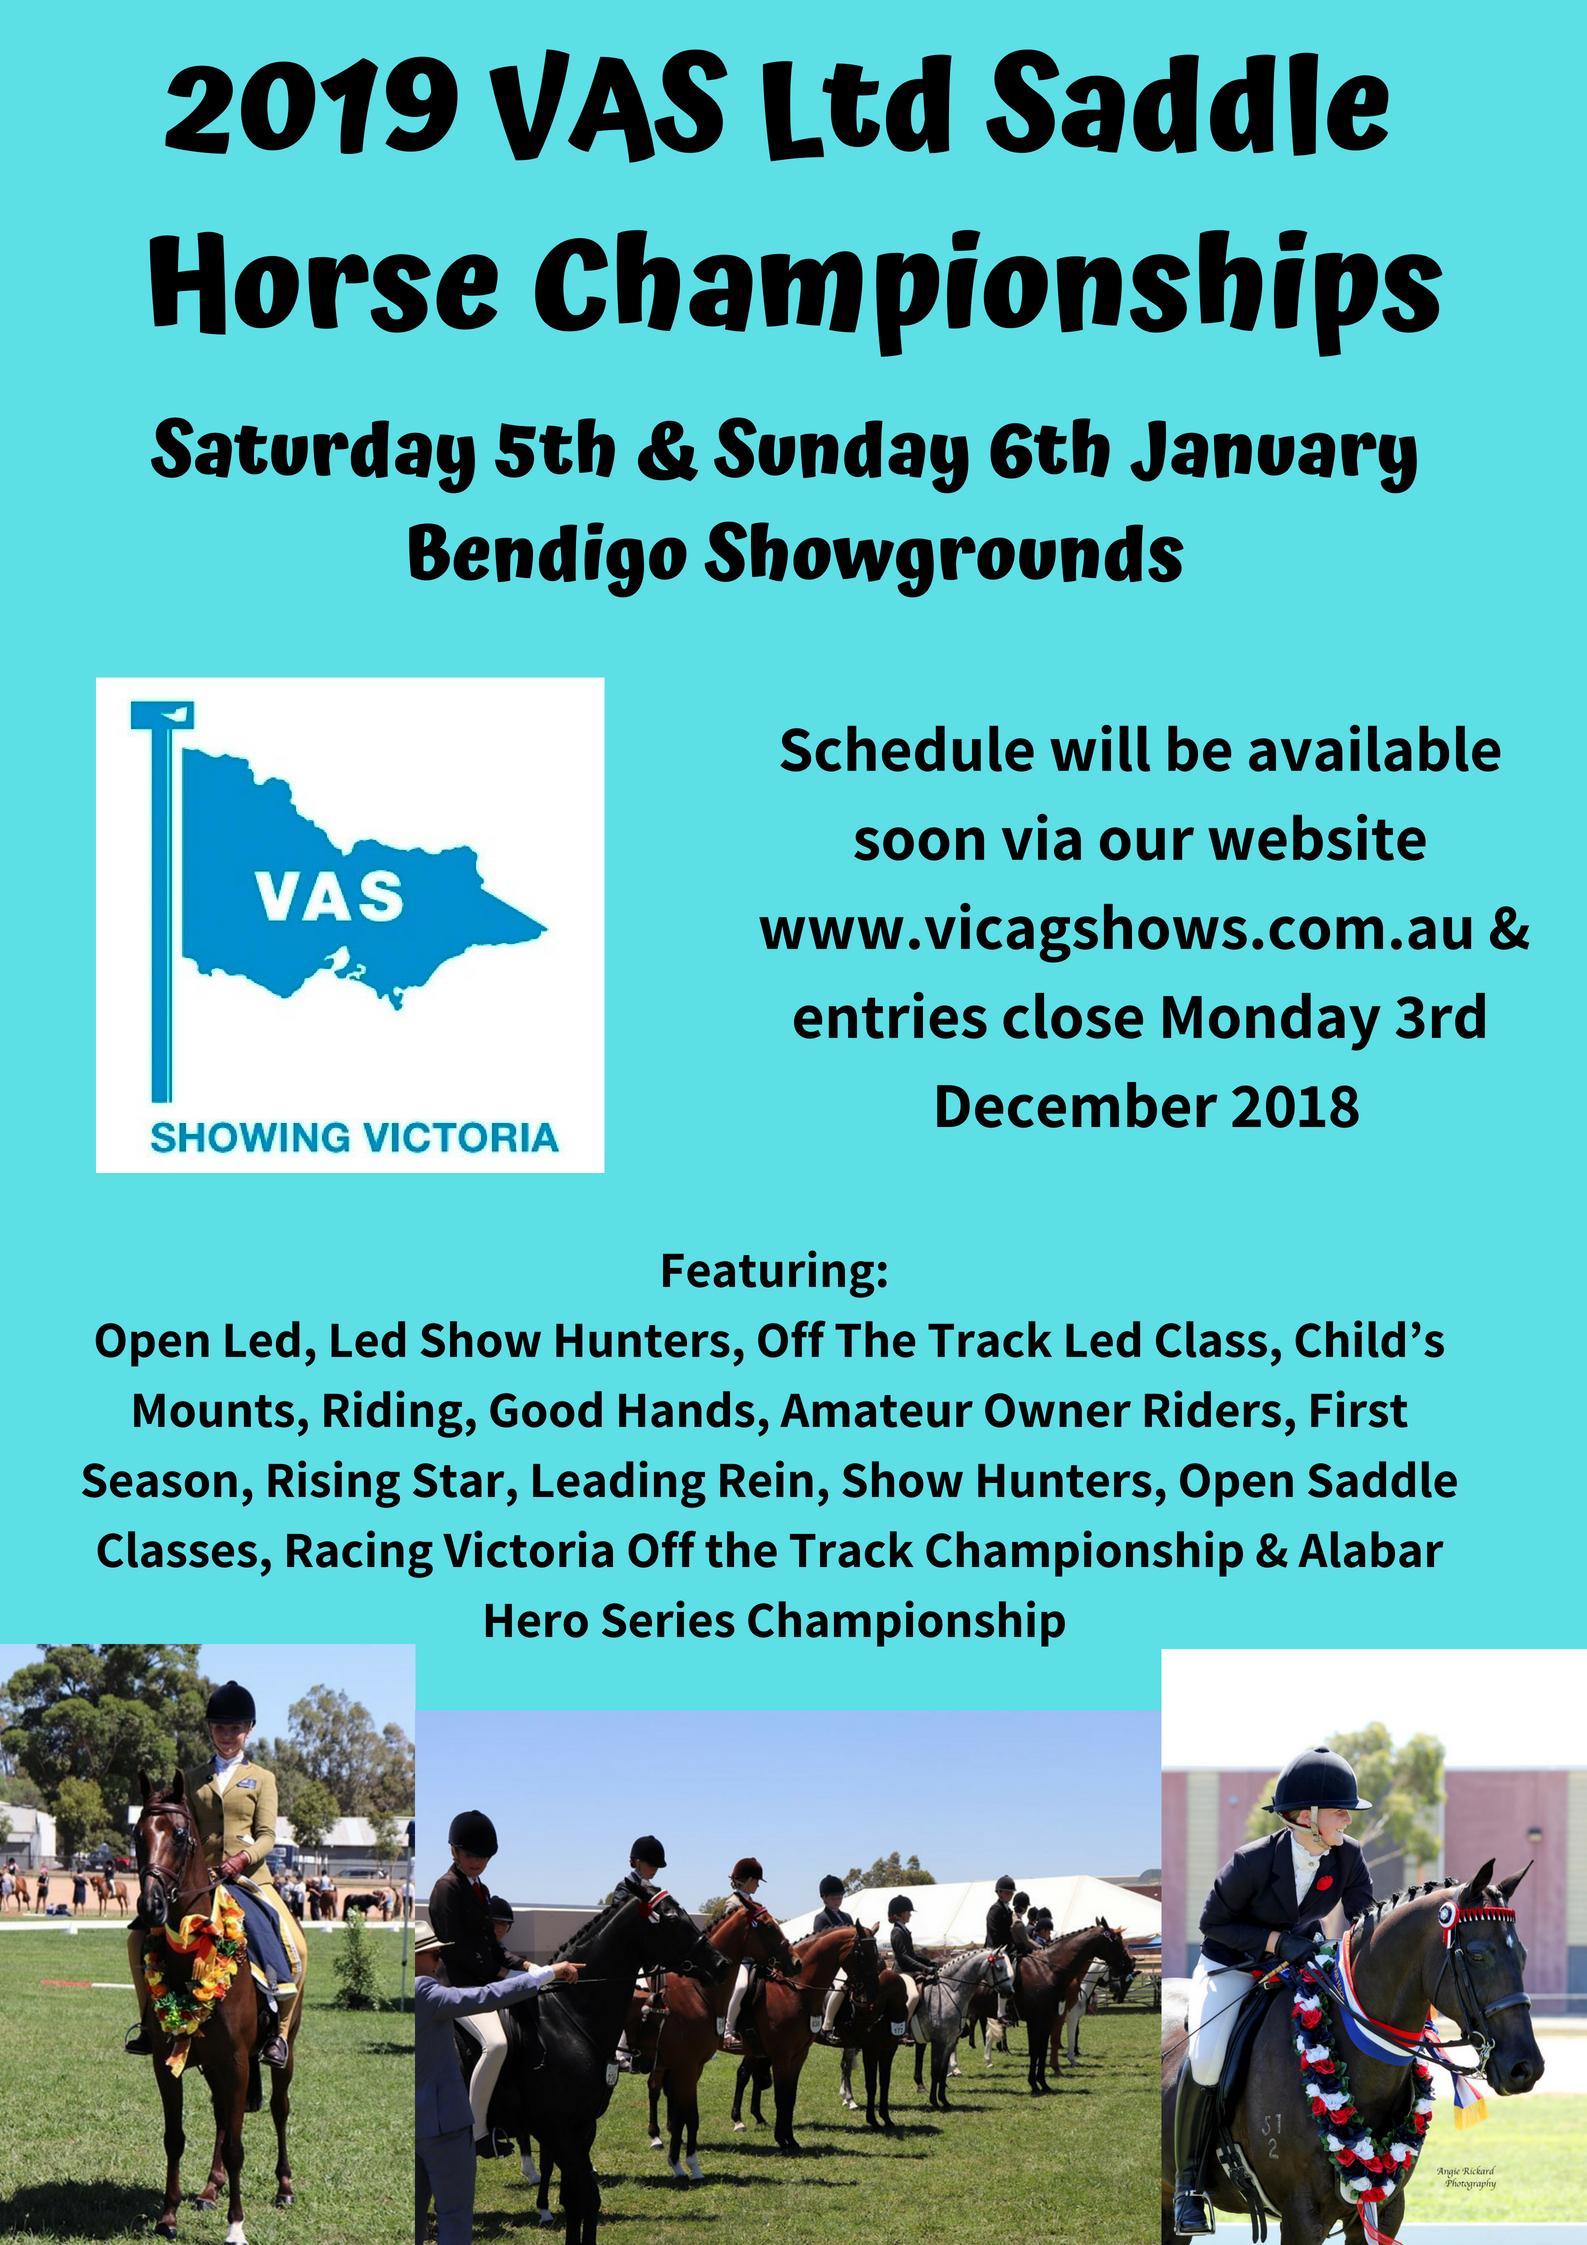 2019 VAS Ltd Saddle Horse Championships.jpg